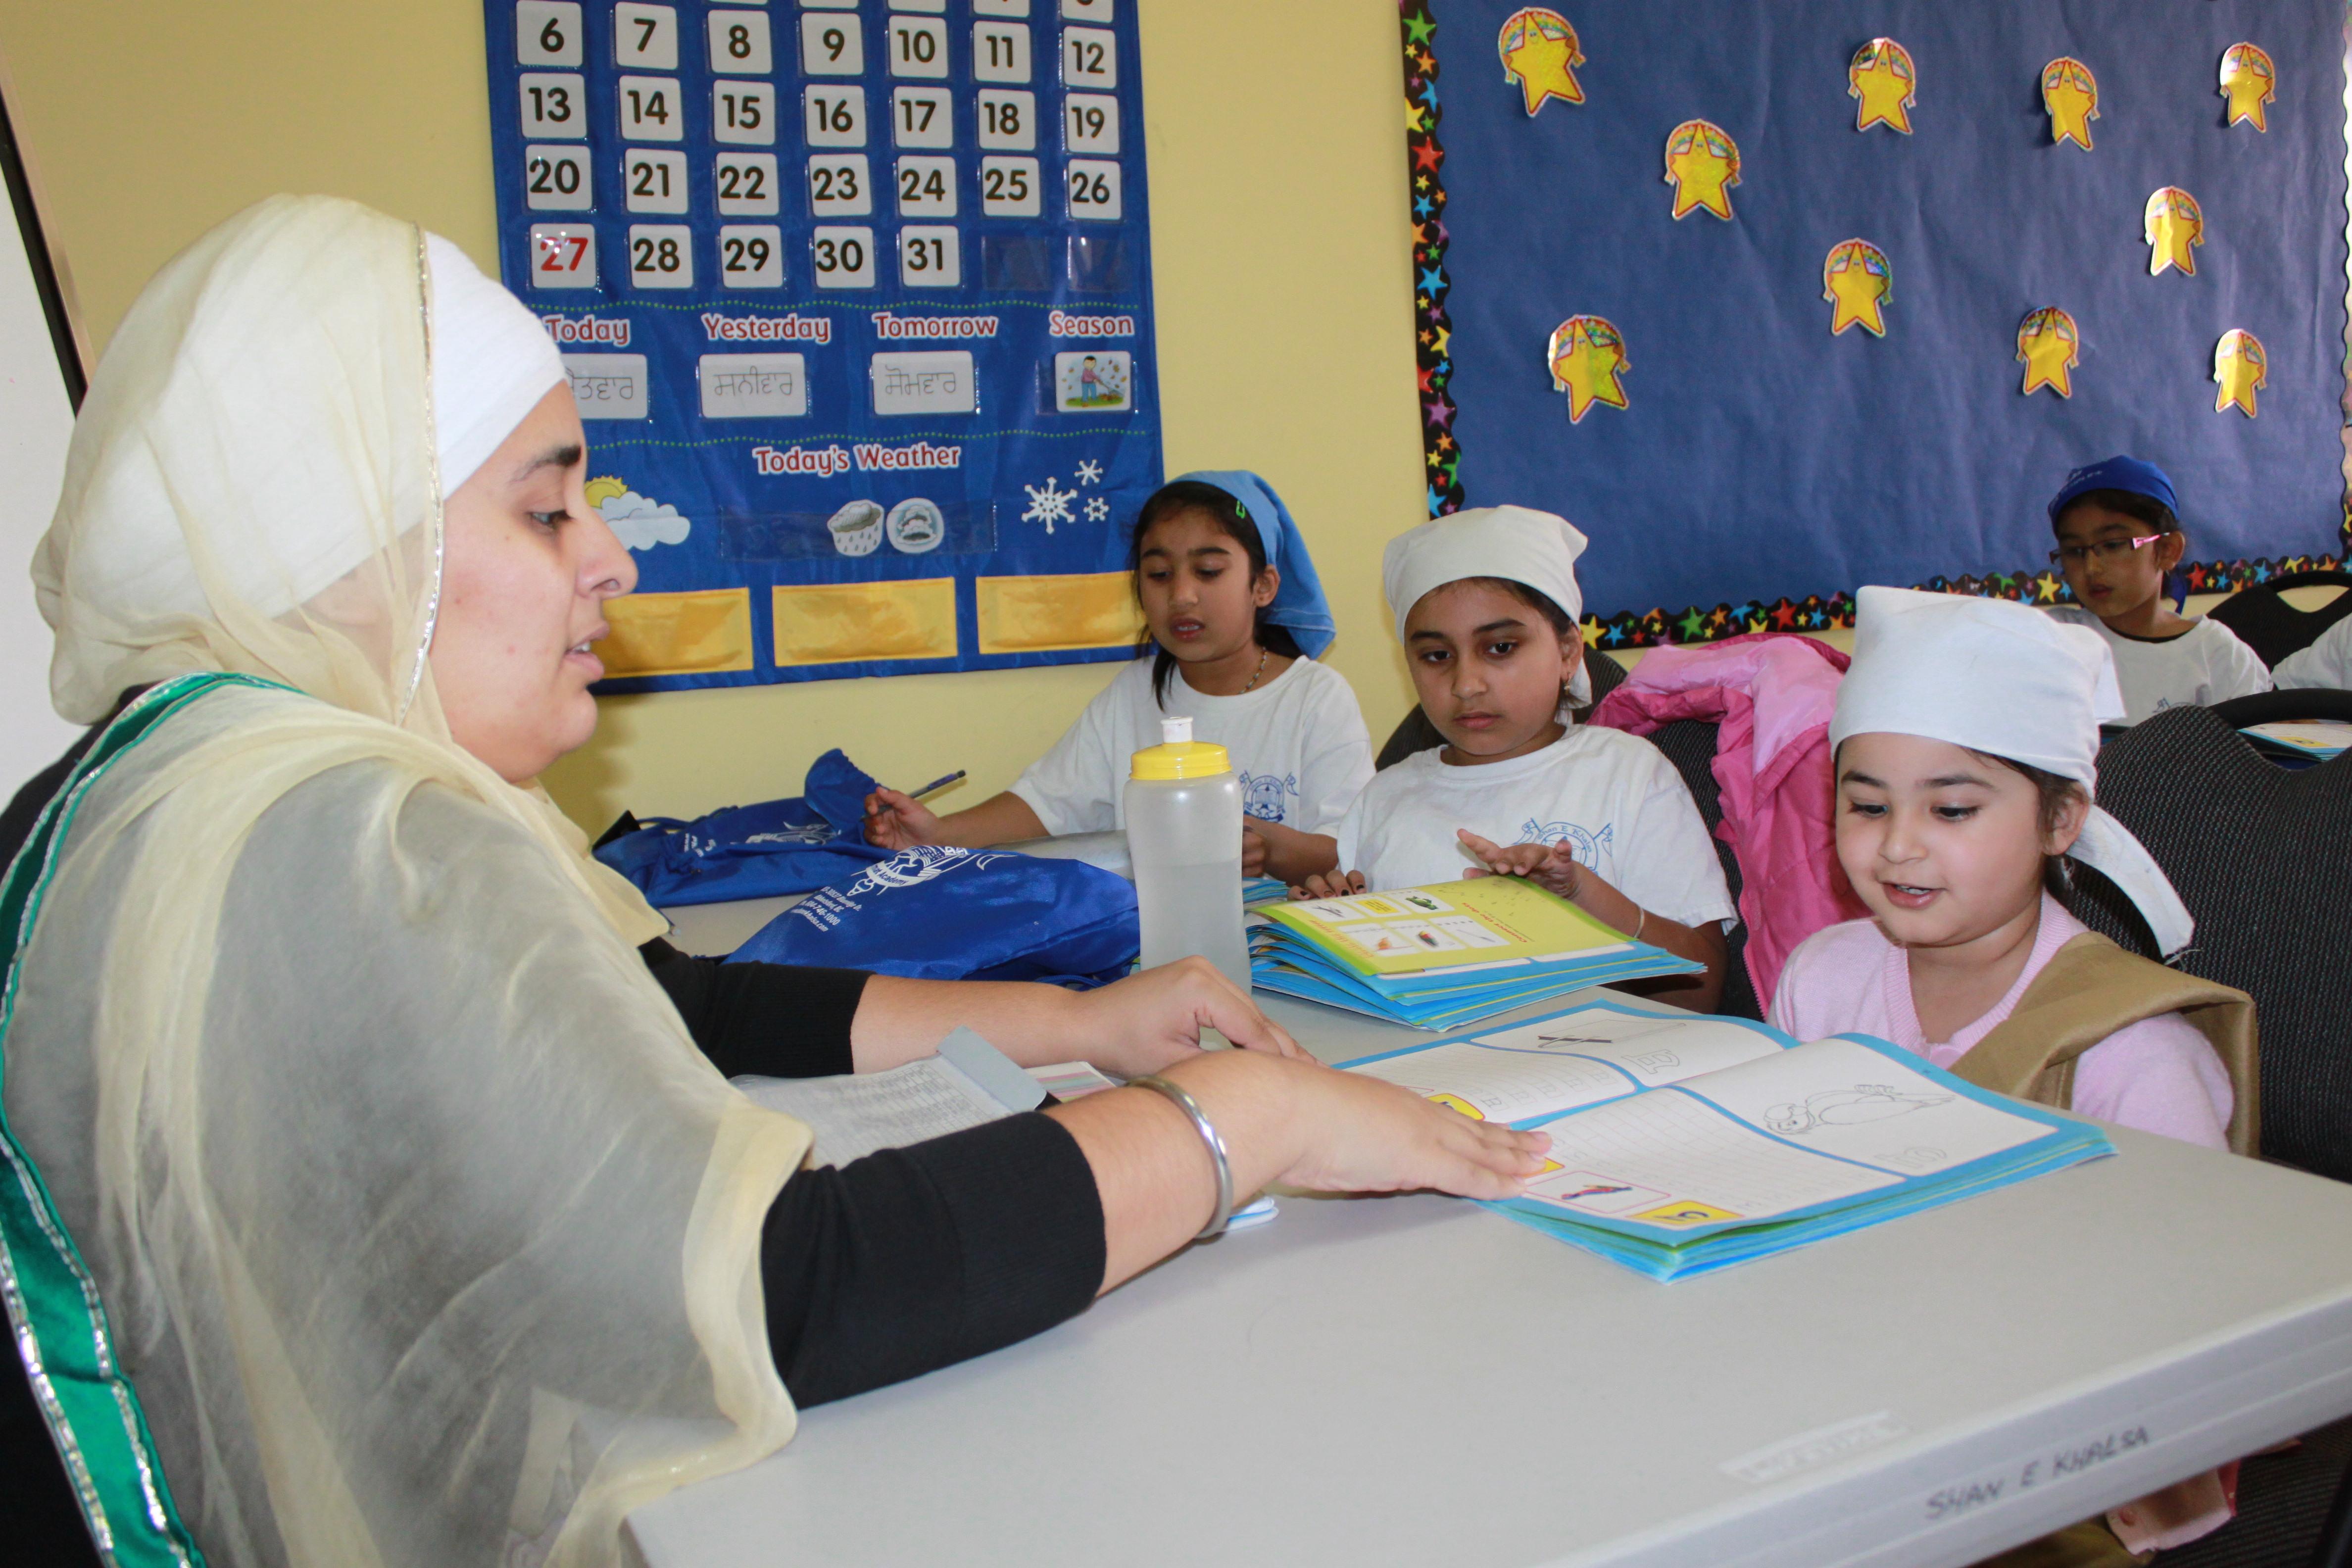 Teacher going through a punjabi workbook with her students